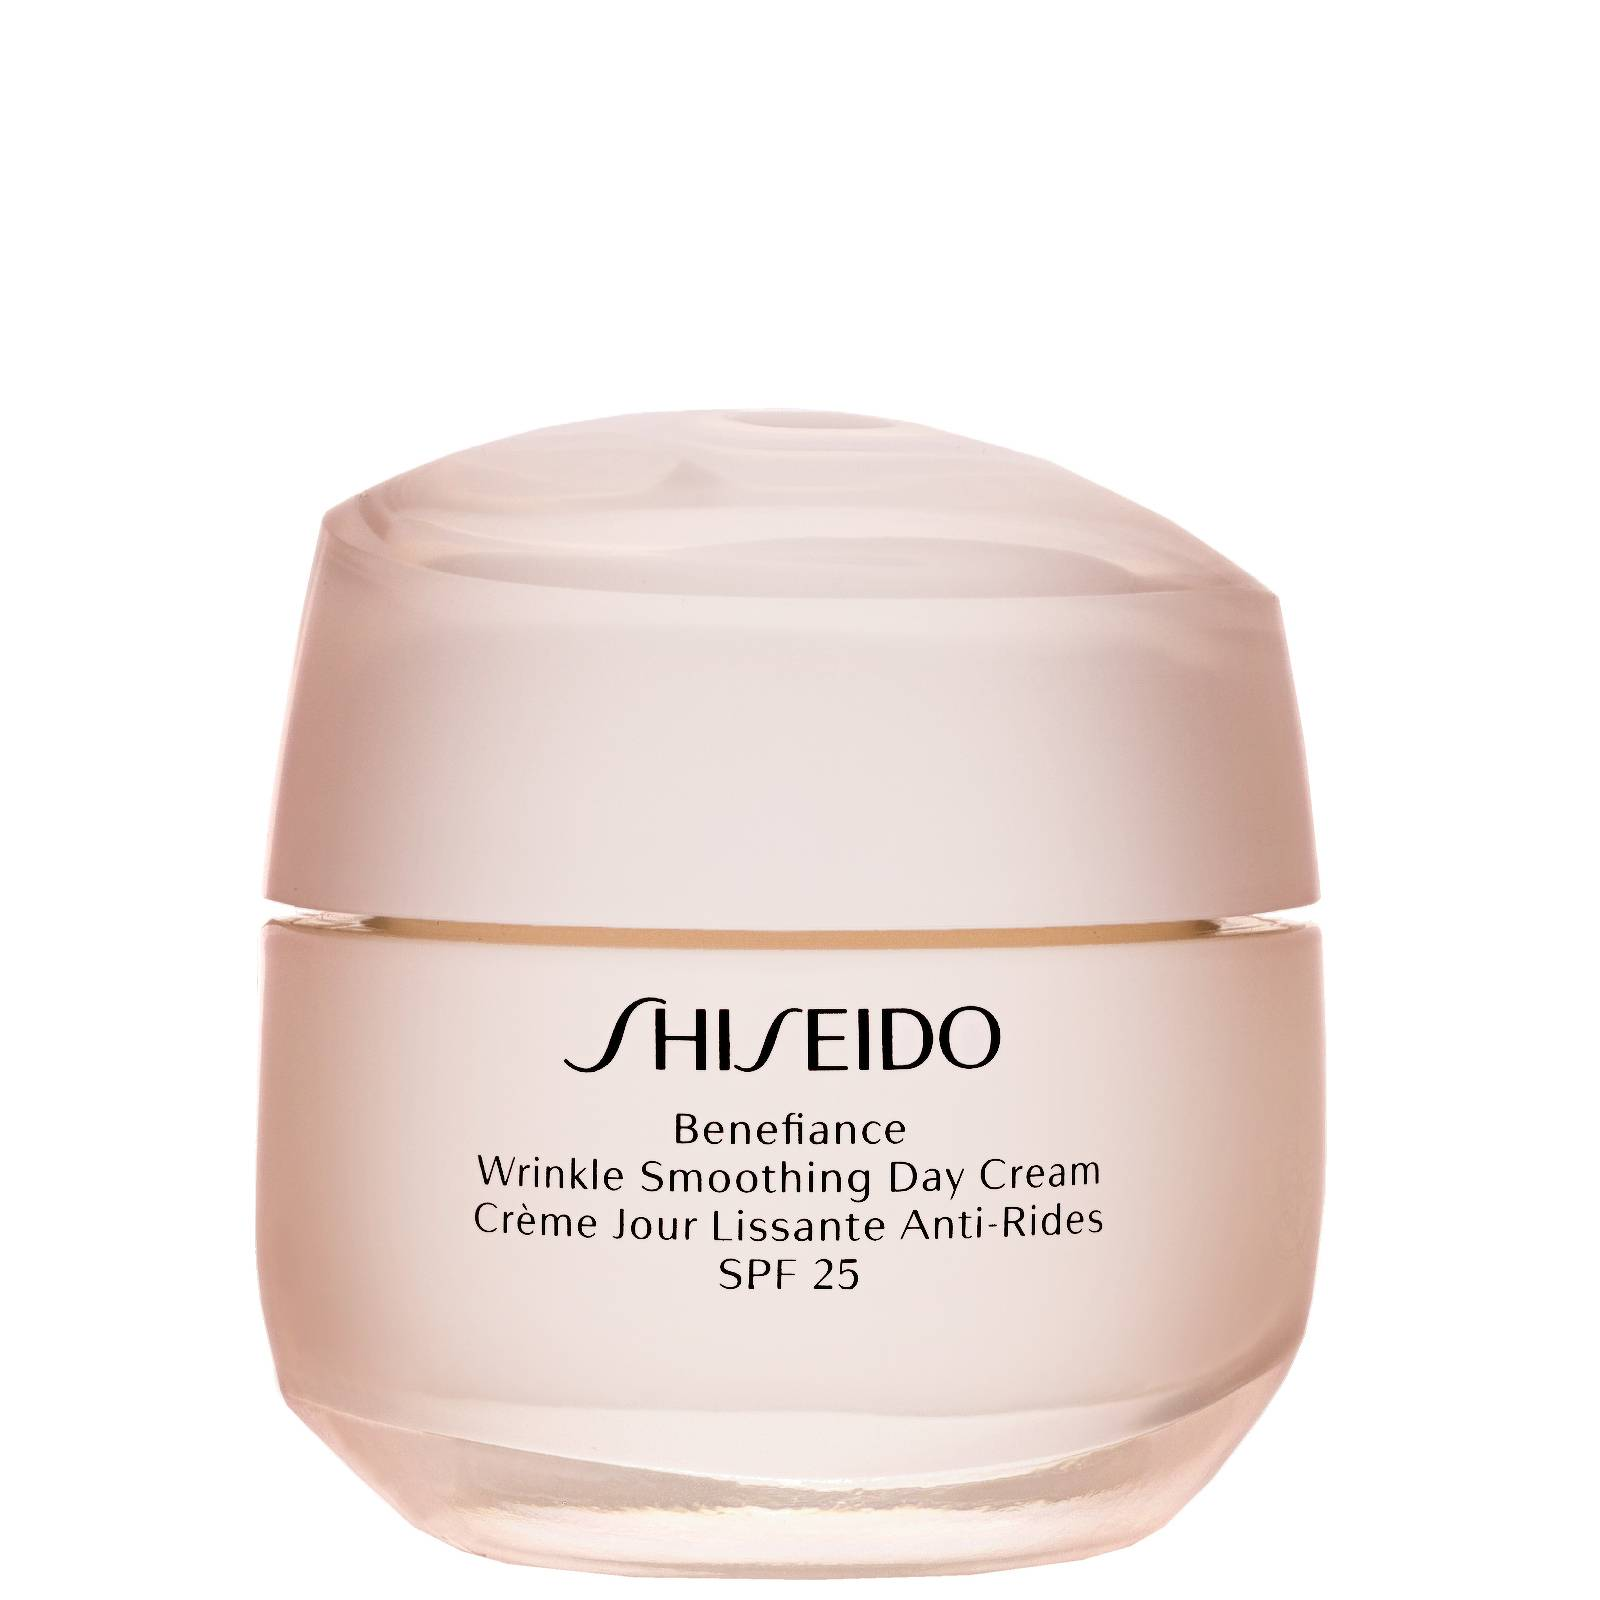 Shiseido Benefiance Ruga Smoothing Day Cream SPF25 50ml / 1.8 oz.